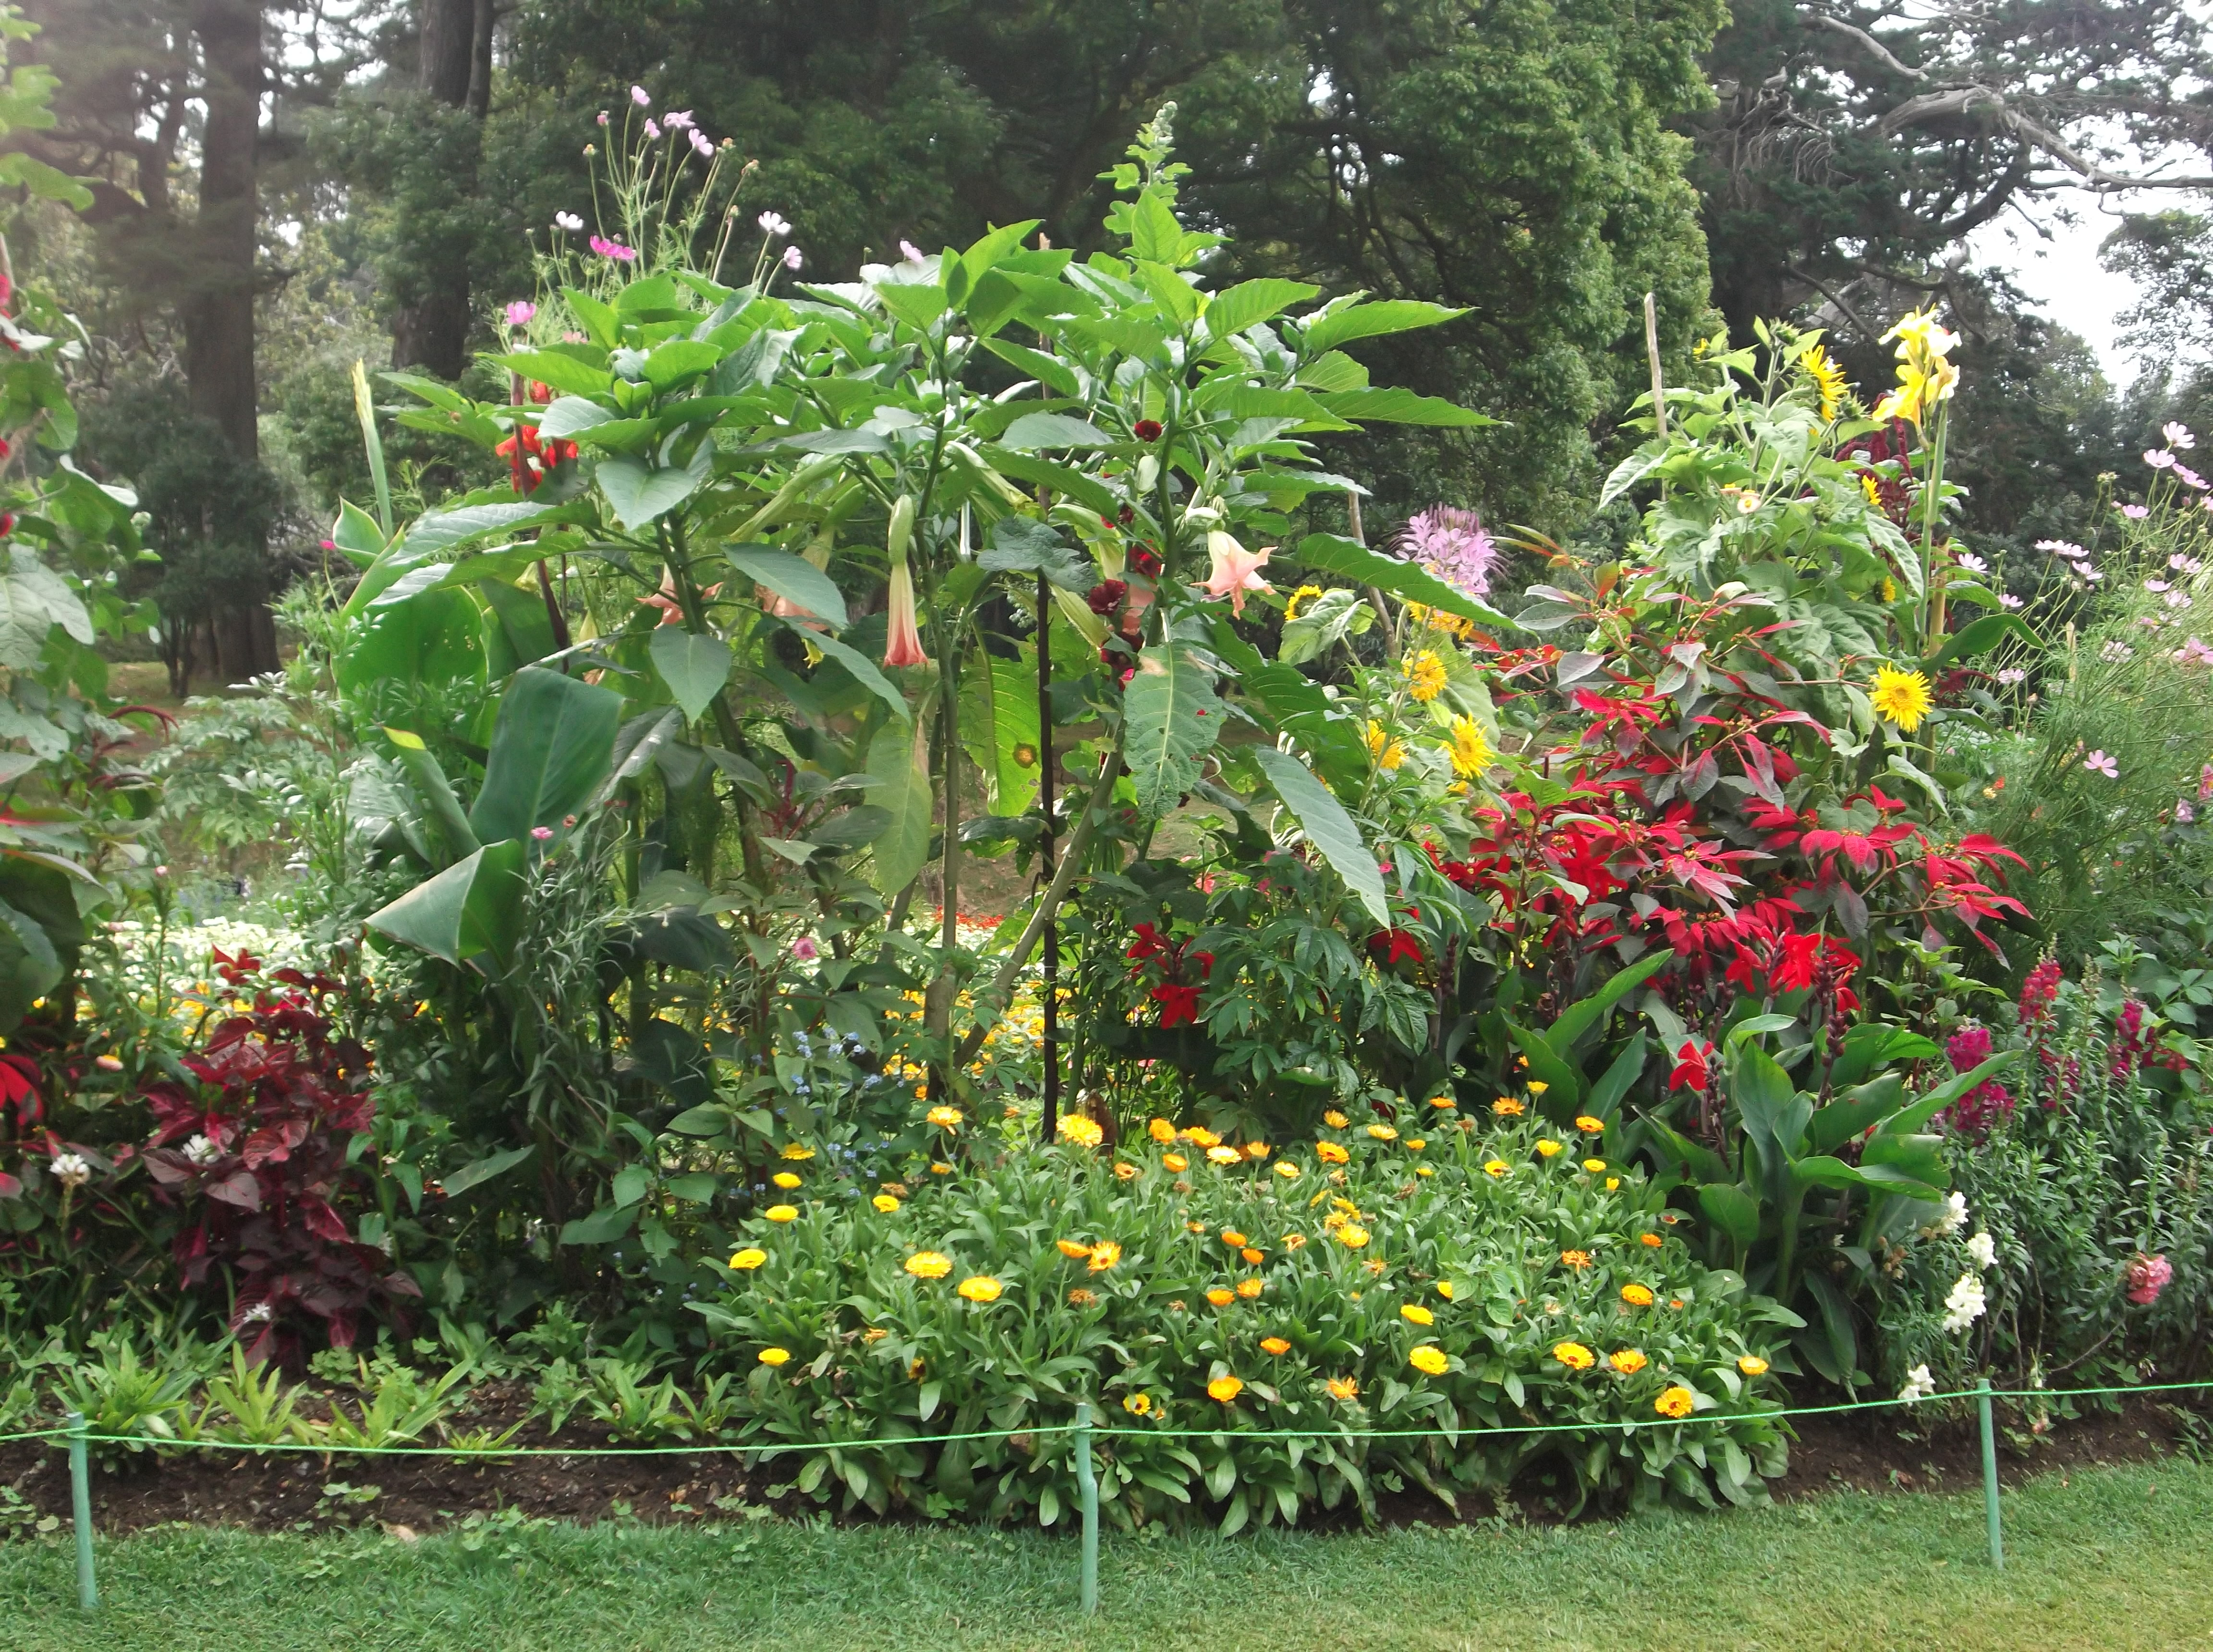 Flower Garden Trees Plants Flowers Hq Photo